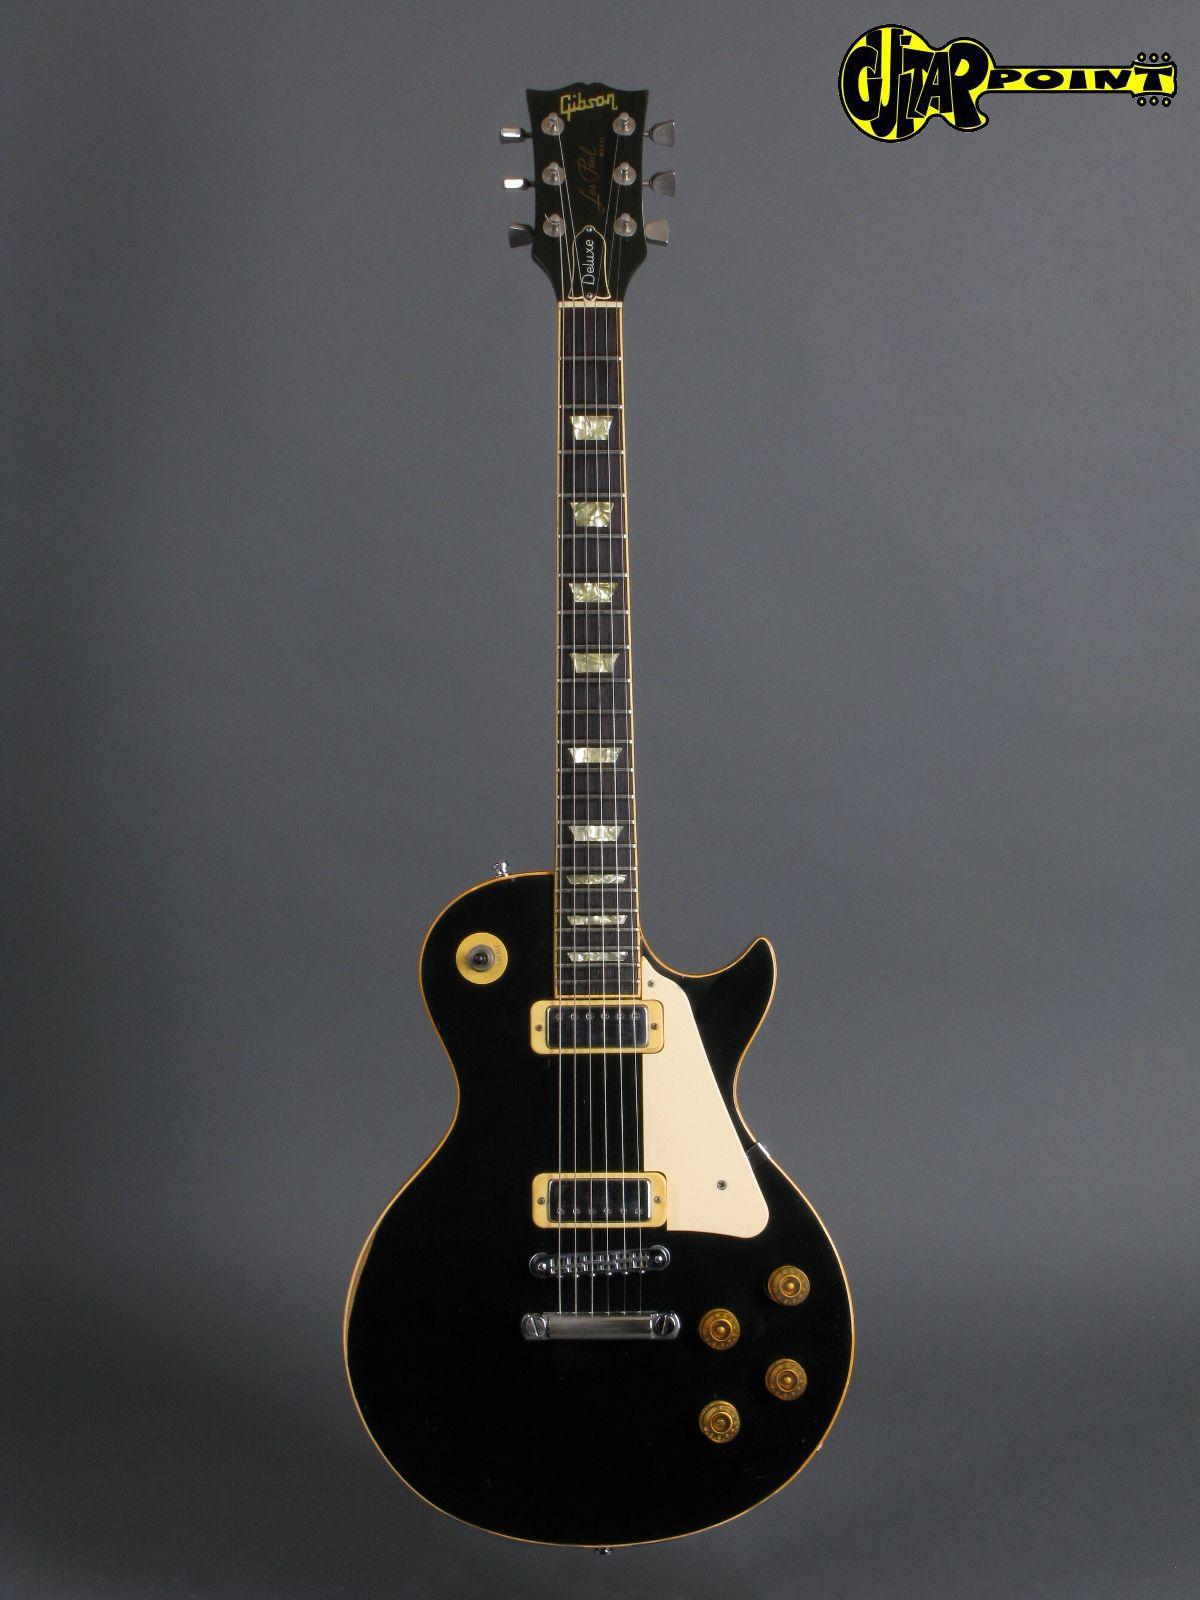 gibson les paul deluxe 1981 ebony black guitar for sale guitarpoint. Black Bedroom Furniture Sets. Home Design Ideas